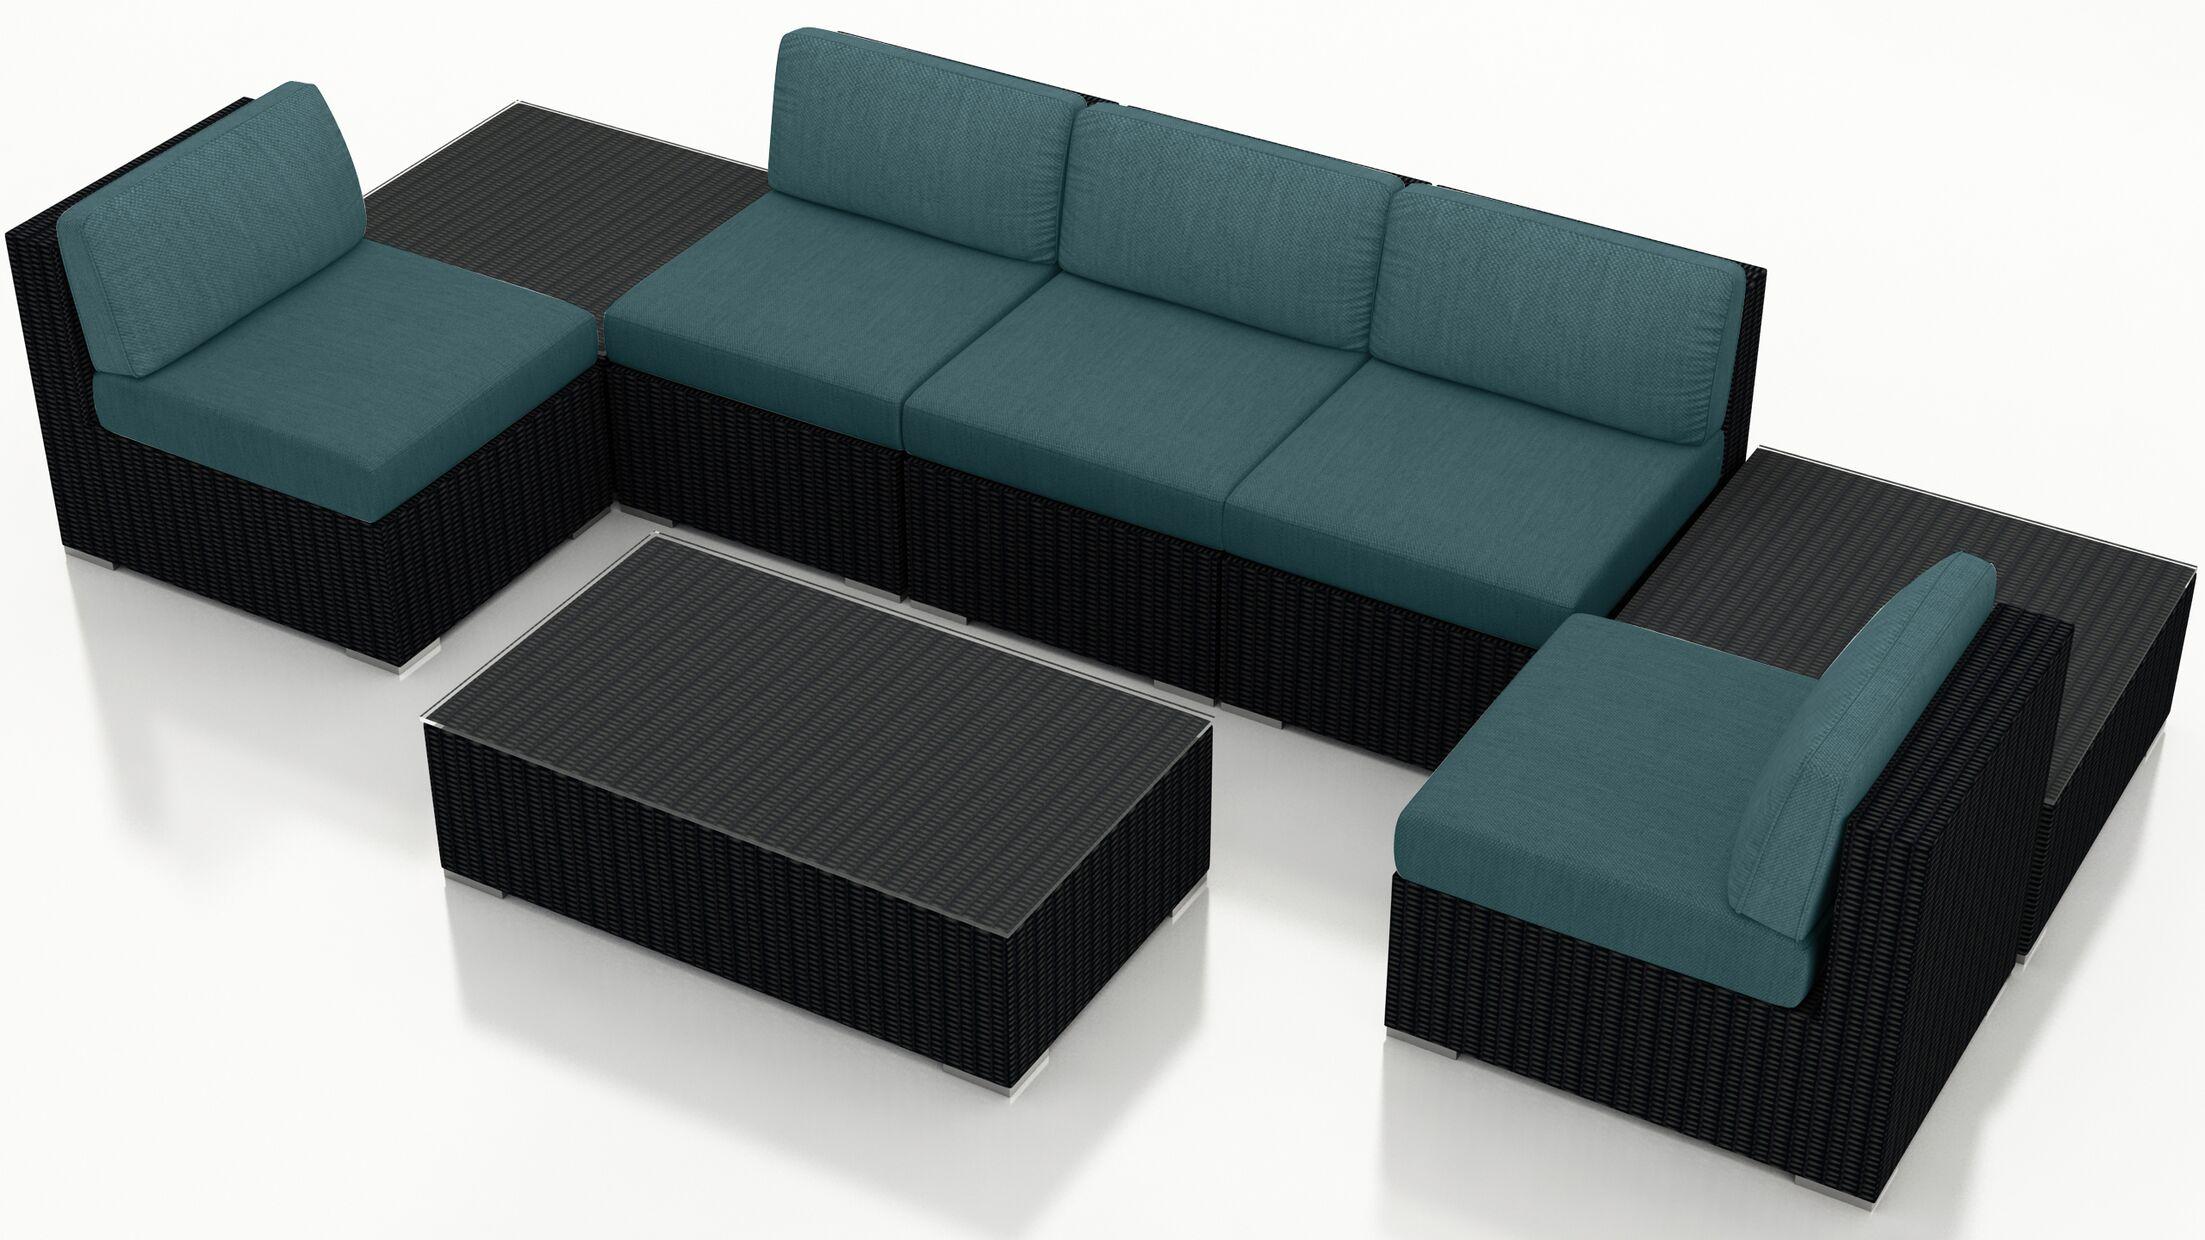 Urbana 8 Piece Sectional Set with Cushions Fabric: Cast Lagoon